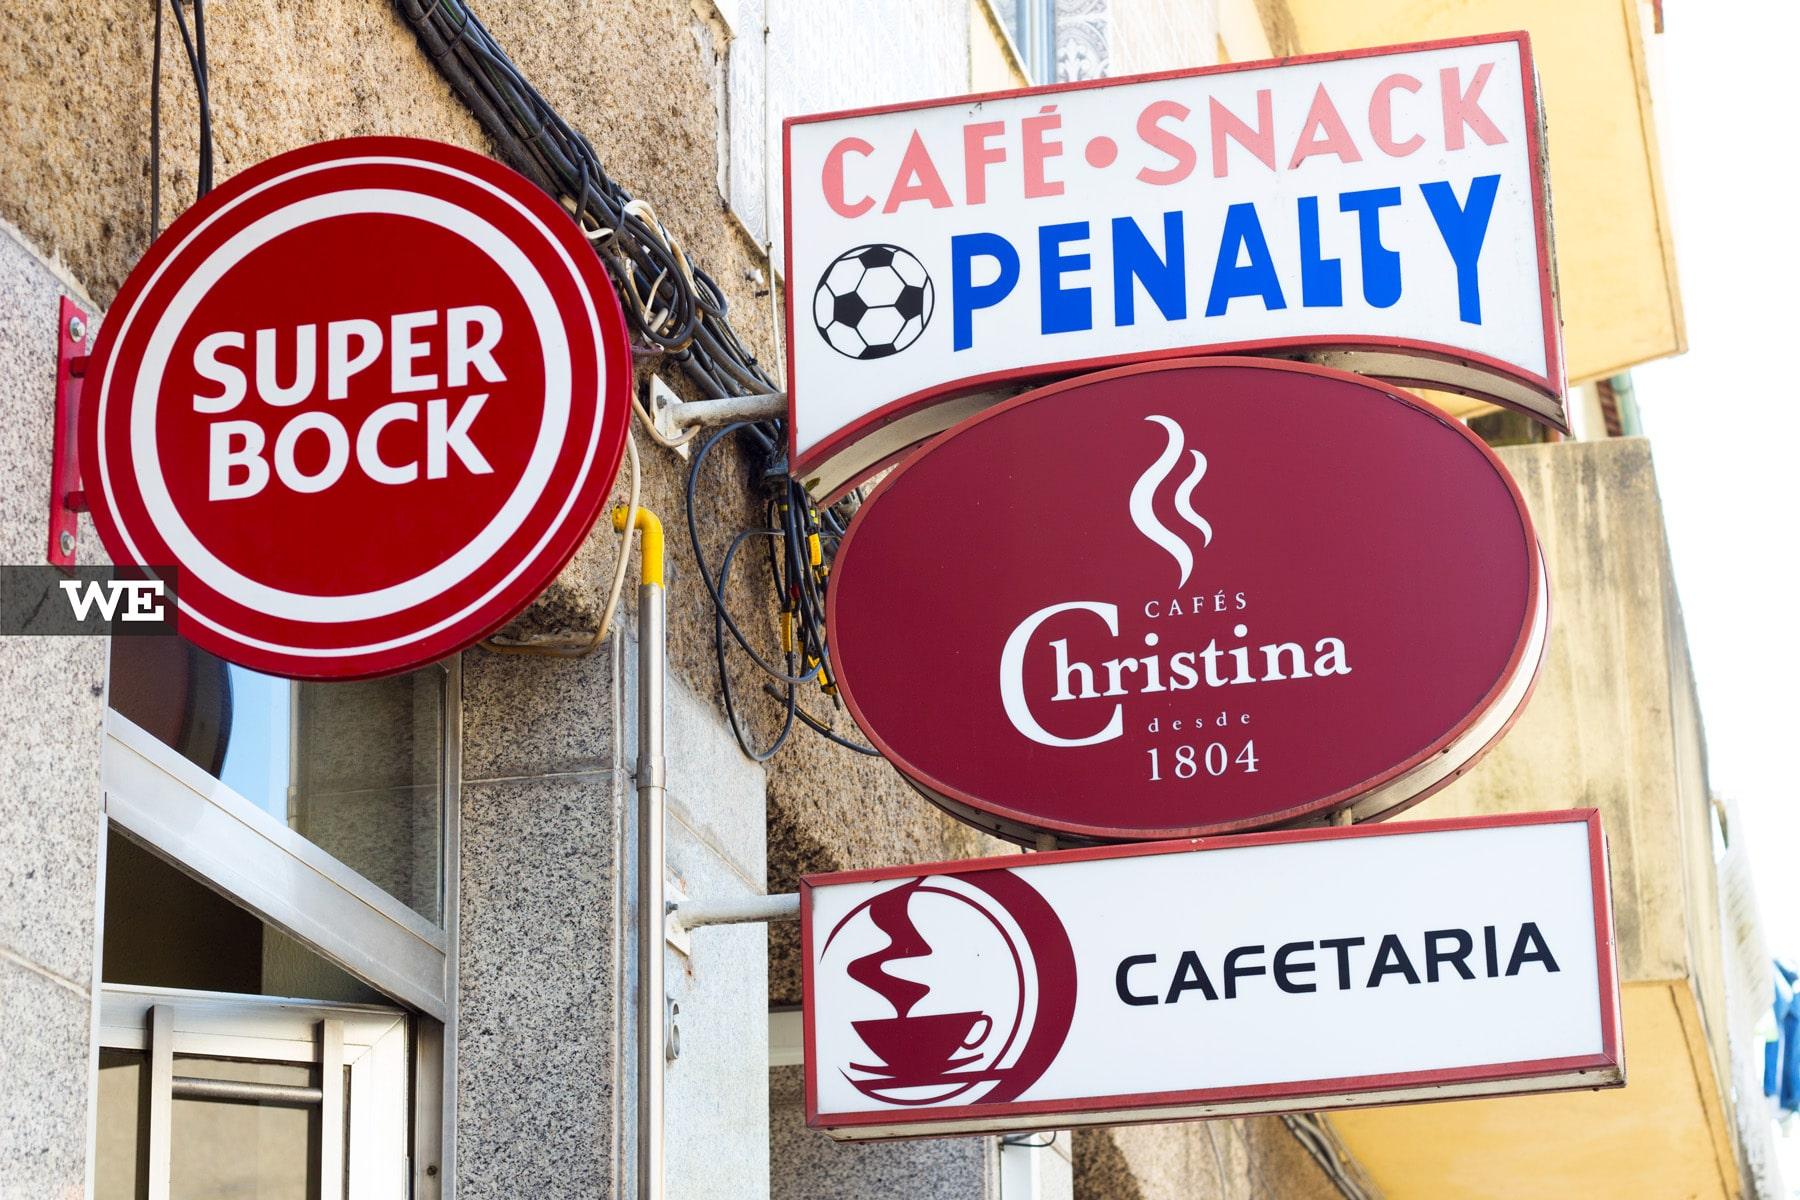 Café Penalty Futebol